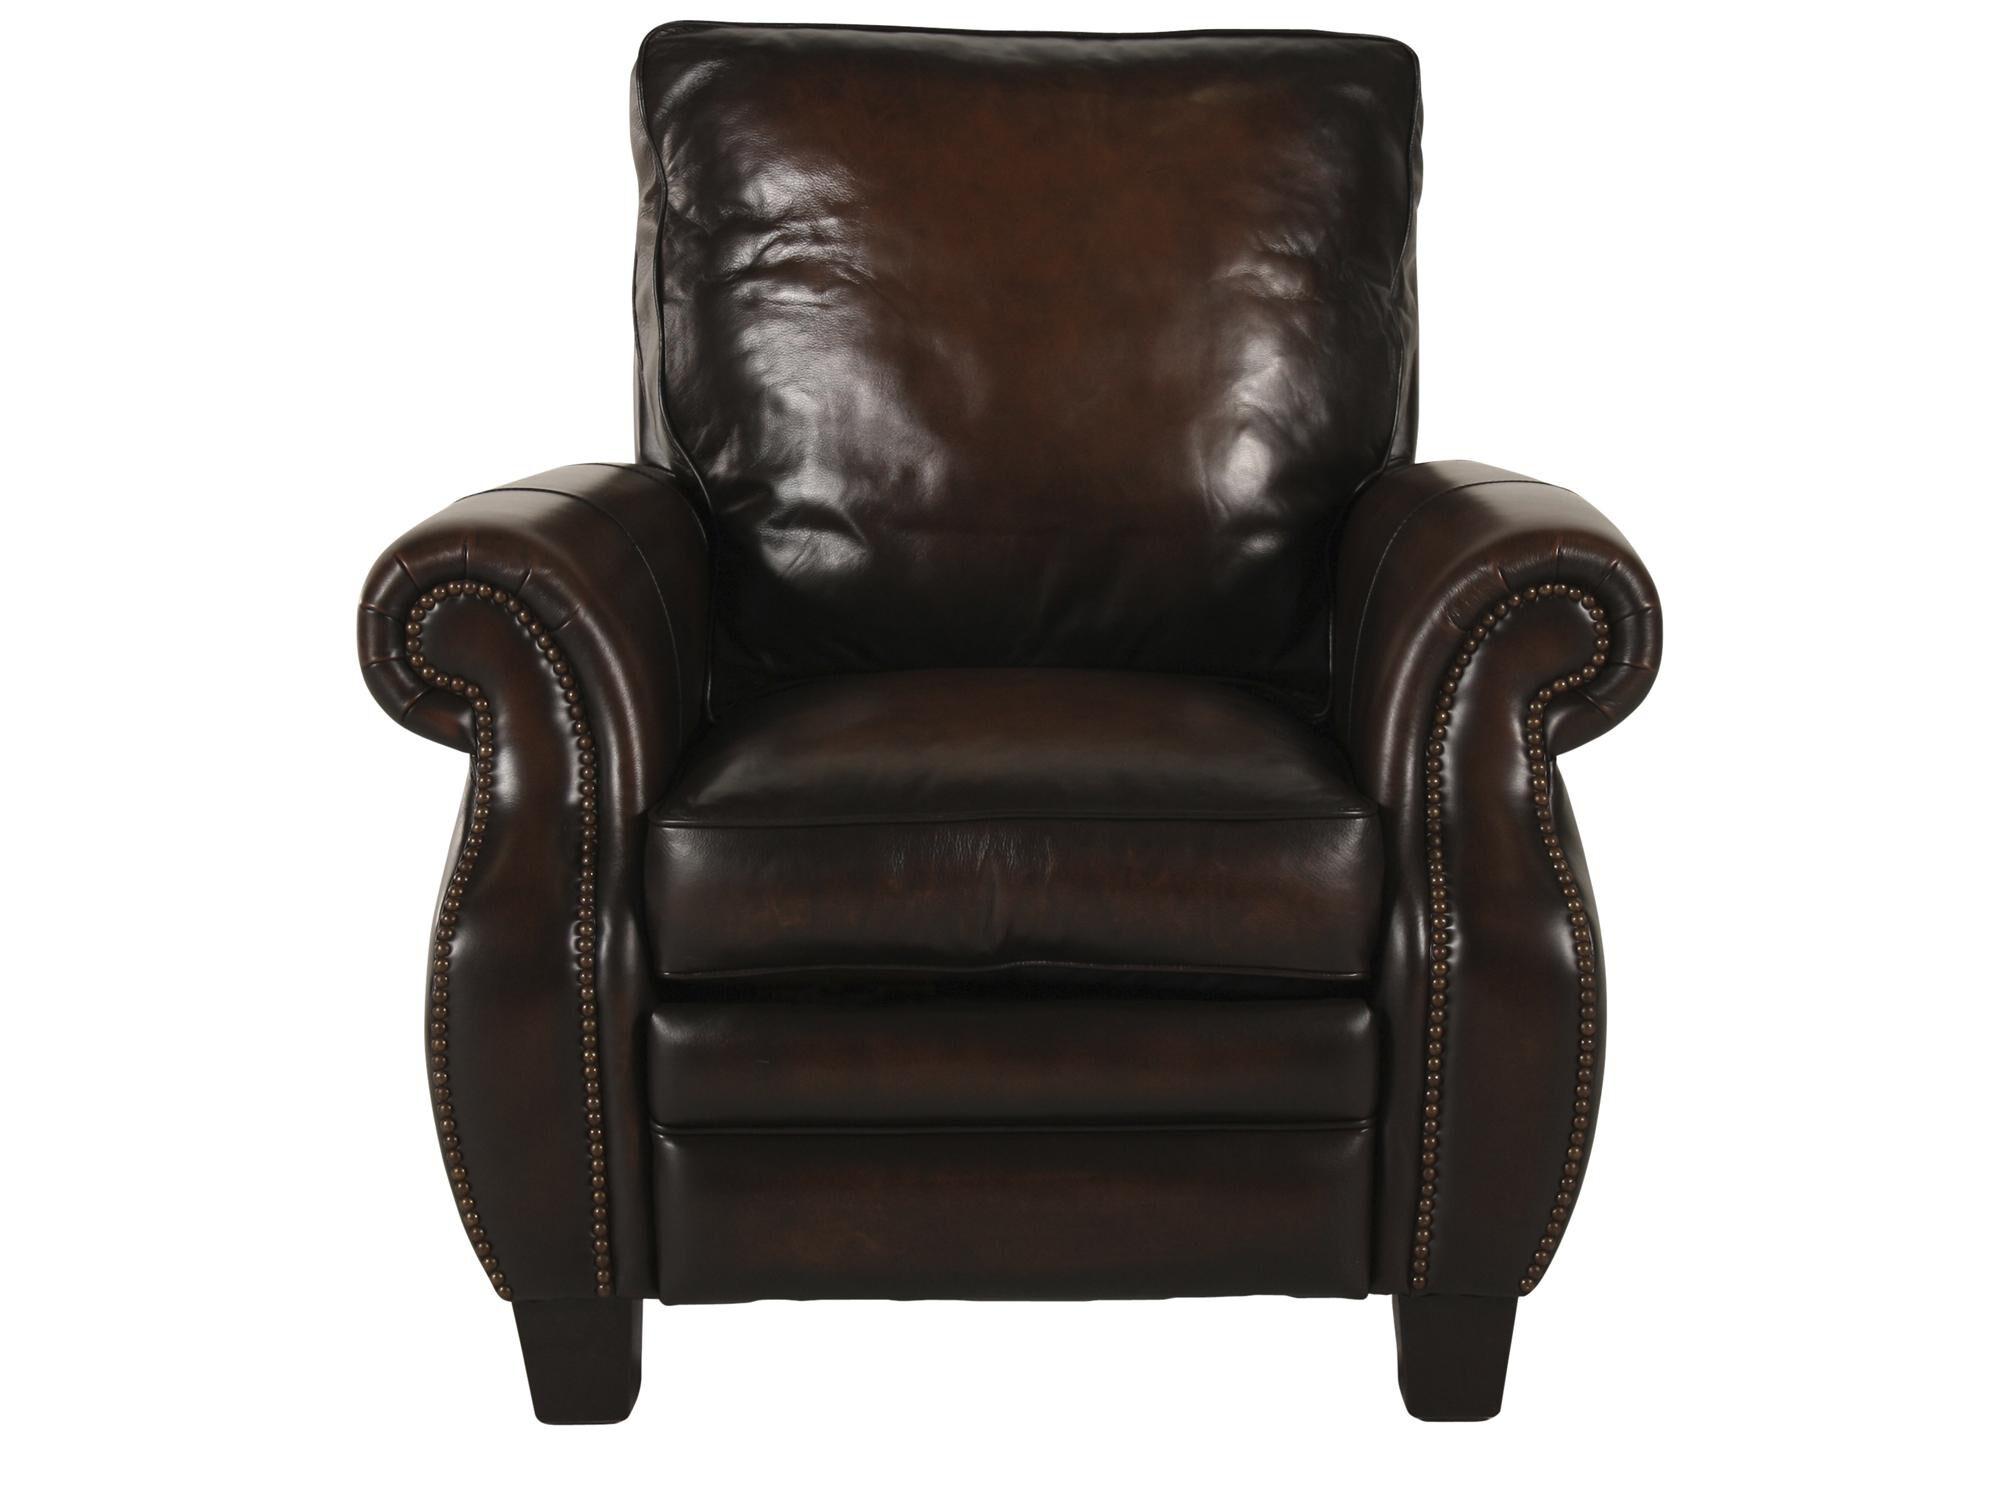 Bernhardt Leather Recliner  sc 1 st  Mathis Brothers & Bernhardt Leather Recliner | Mathis Brothers Furniture islam-shia.org